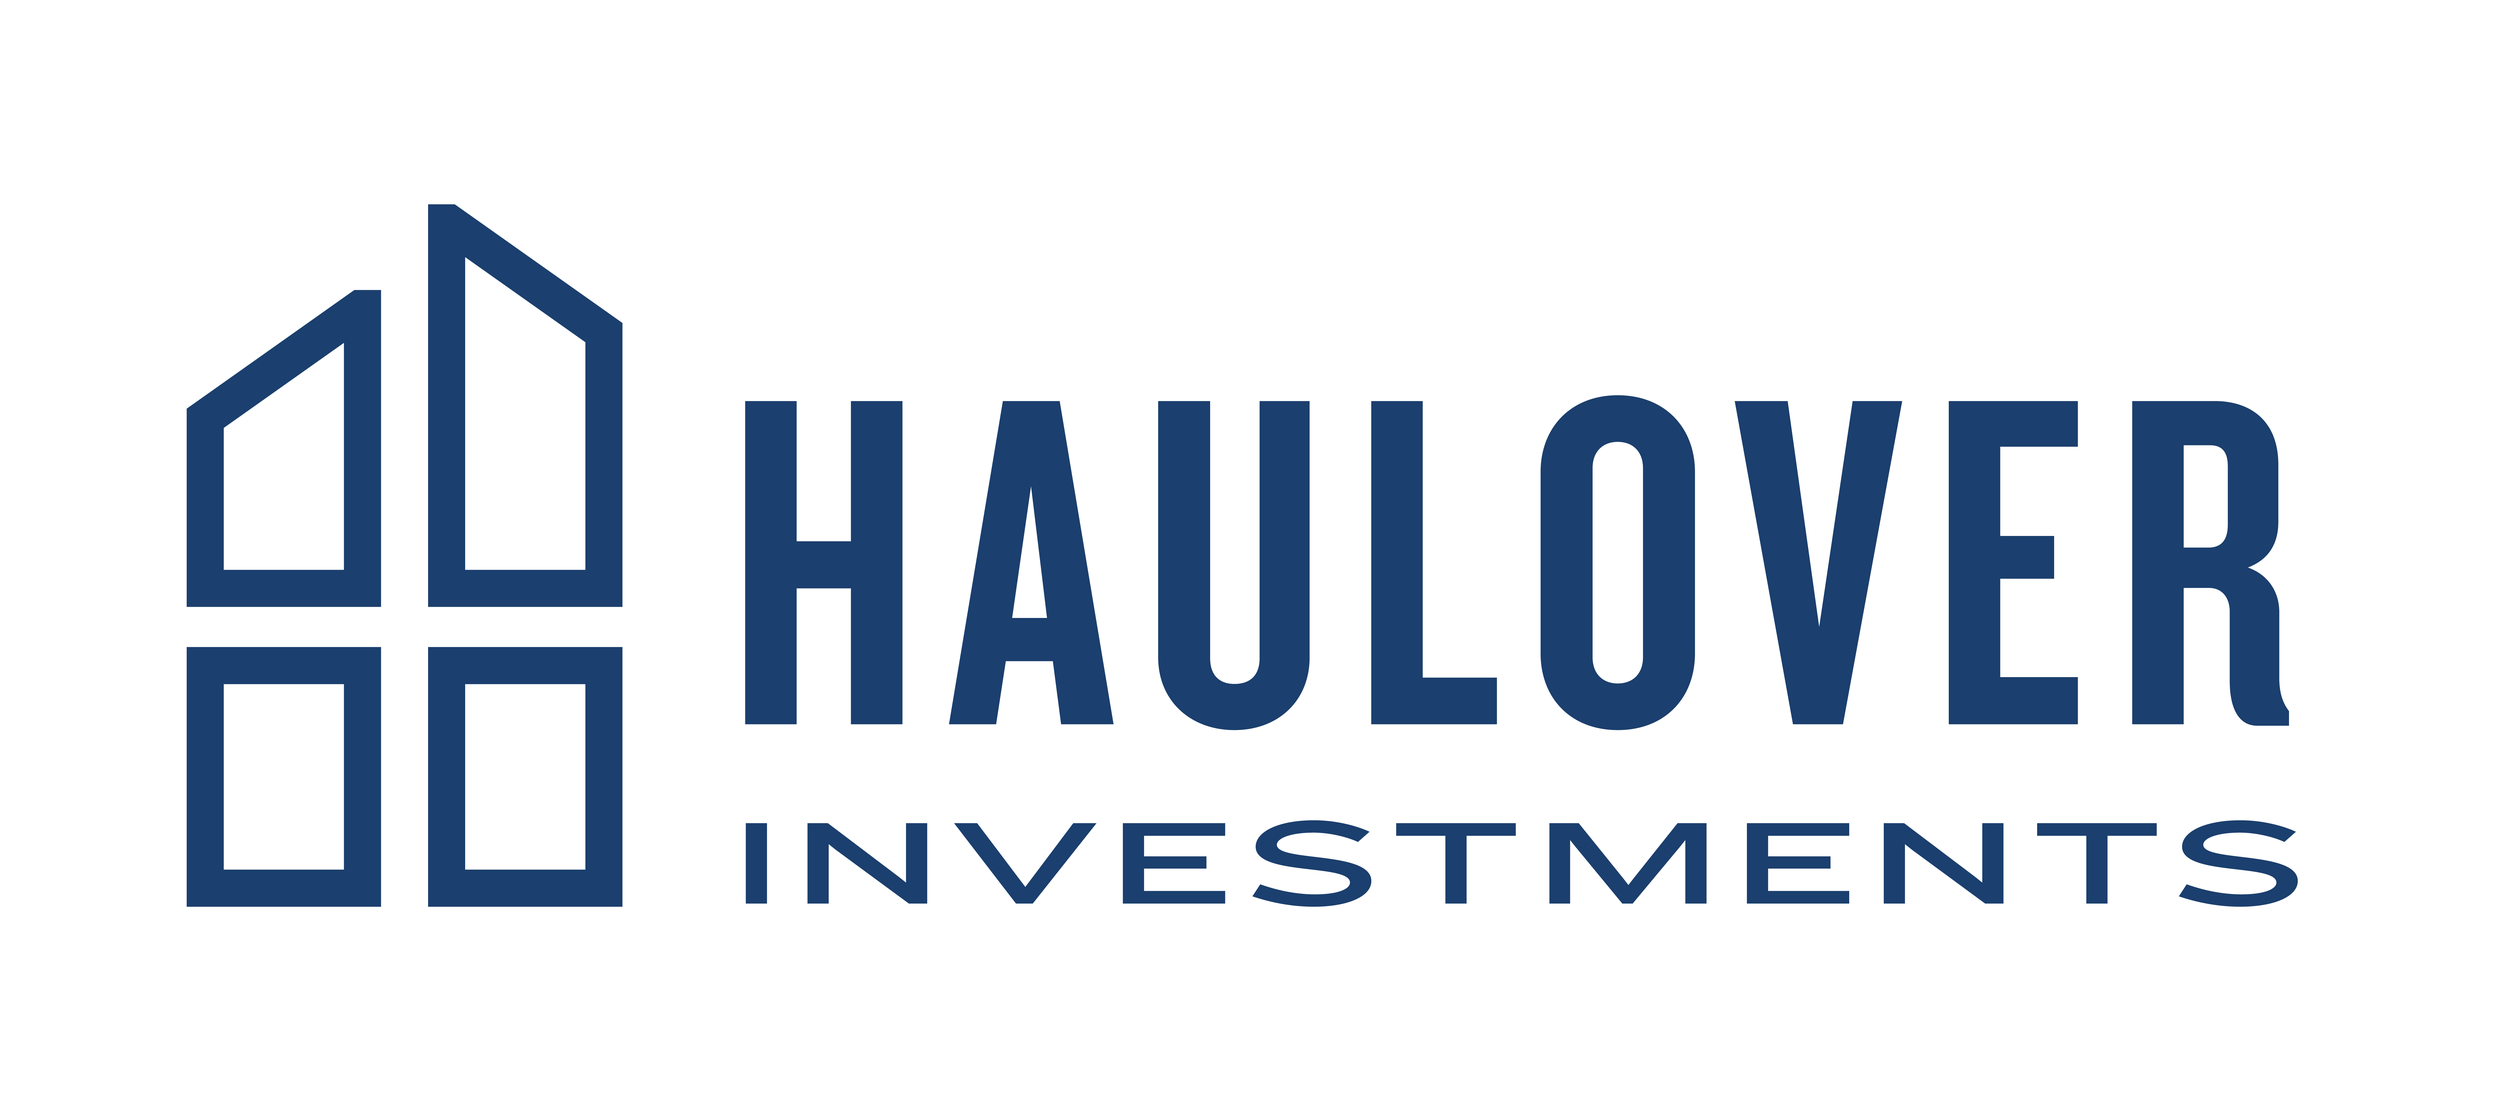 HauloverInvestments-logo-horizontal.png